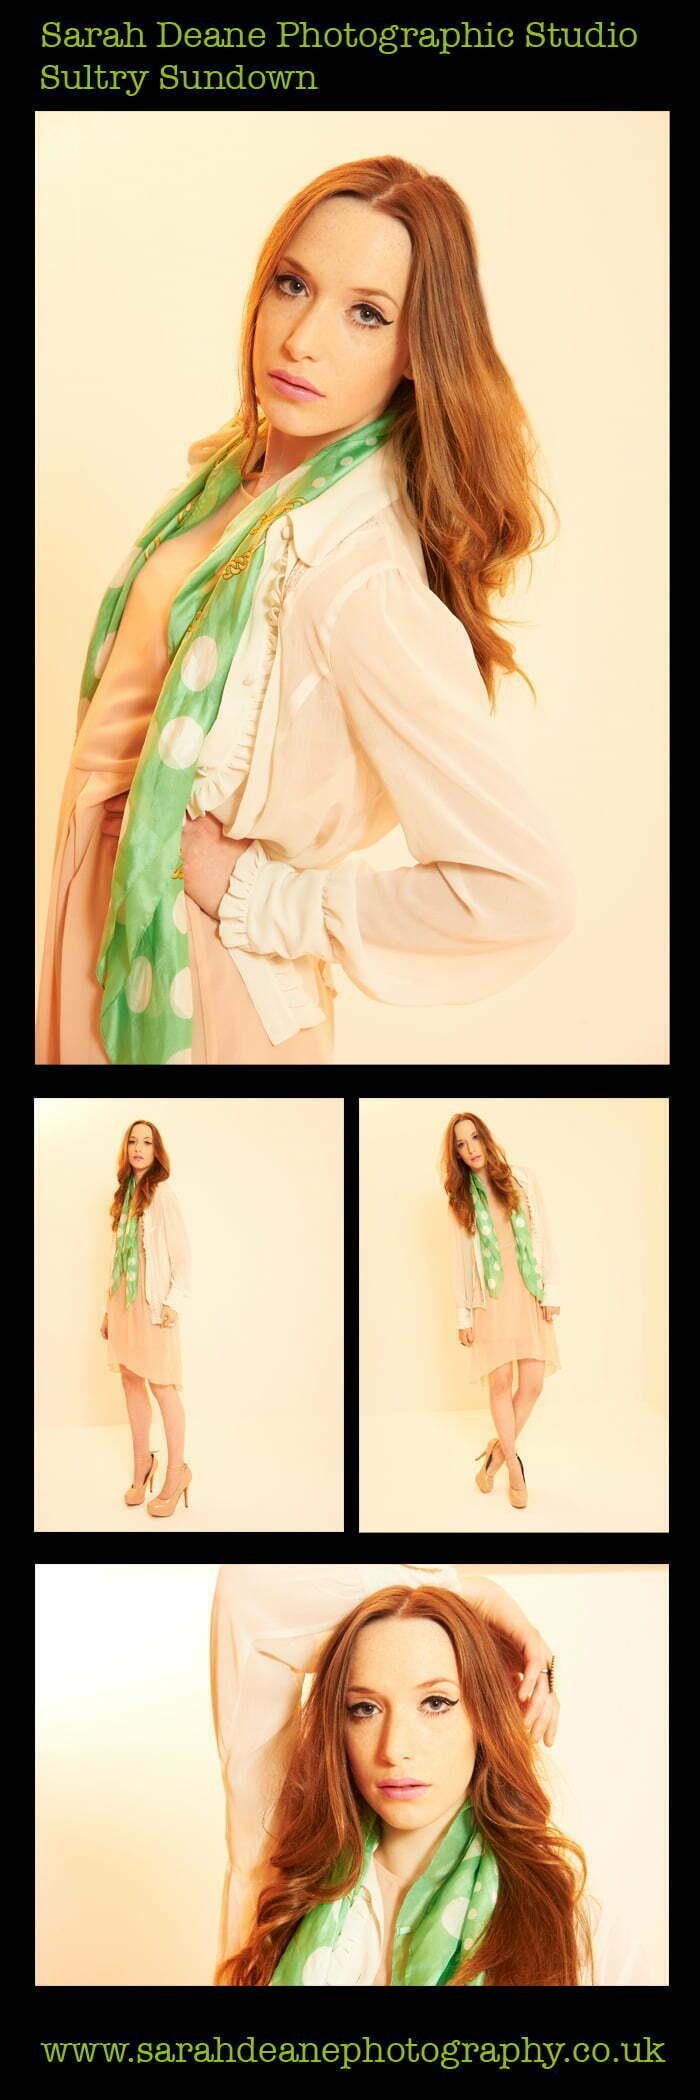 Sultry sundown fashion shoot newcastle studio